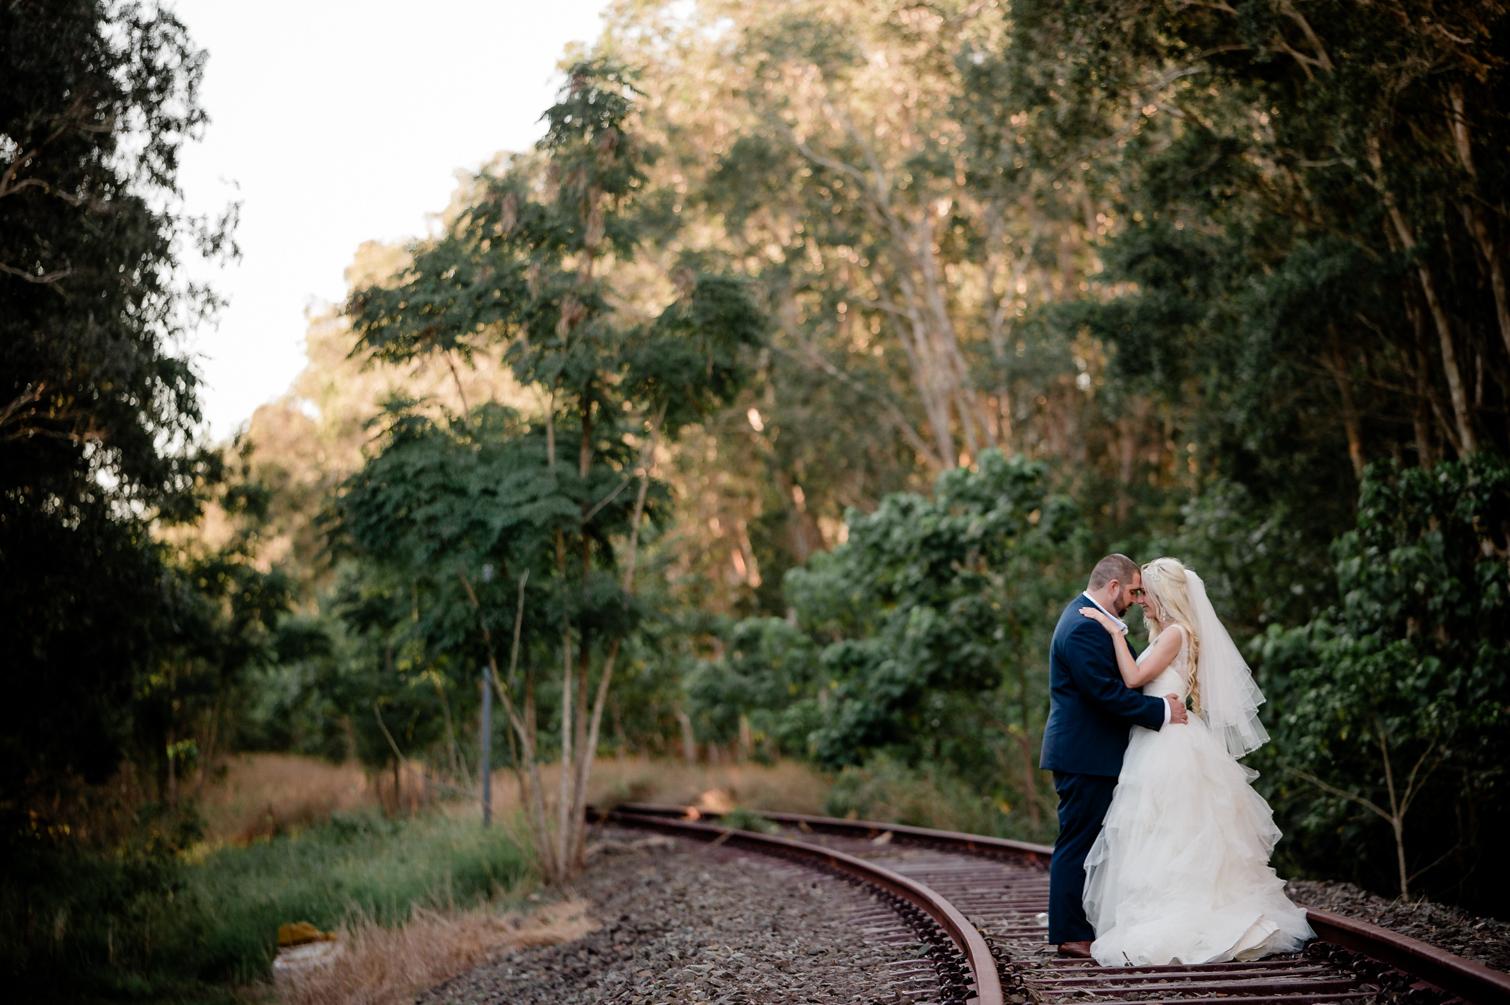 The_Belongil_Byron_Bay_Weddings_New_Black_Studios-113.jpg